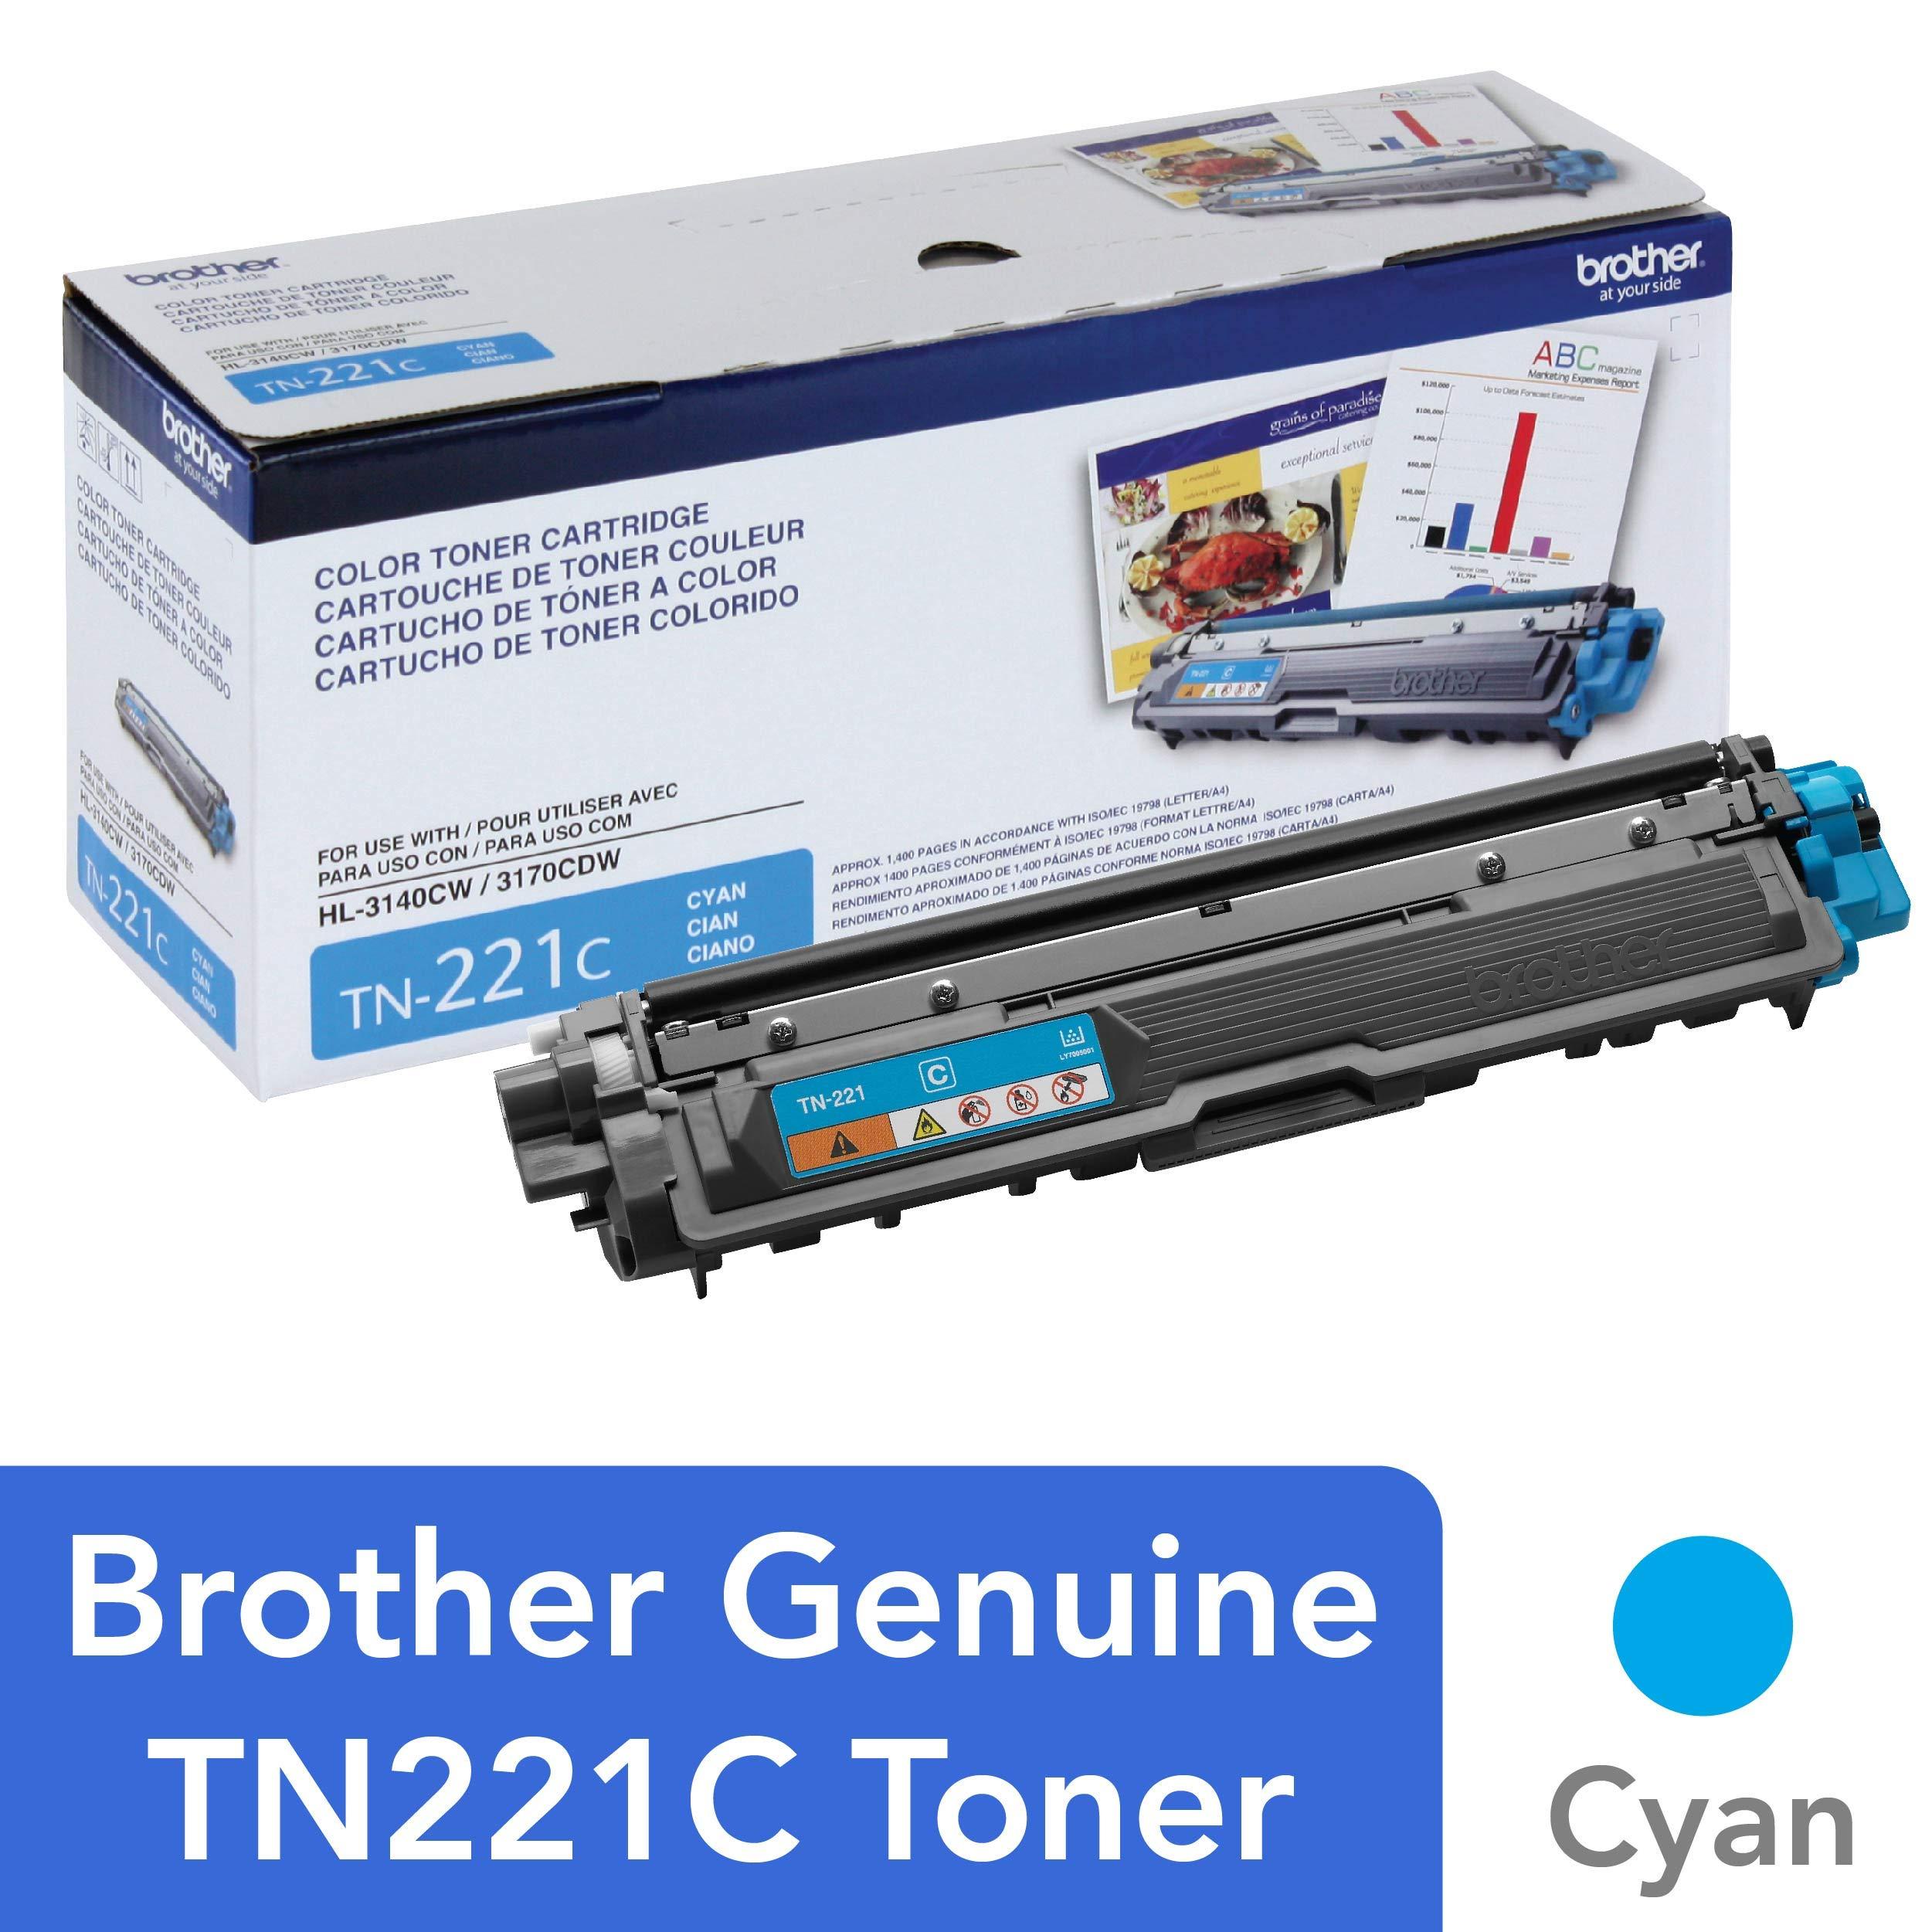 Toner Original BROTHER TN-221C DCP-9015 9020 HL-3150 3170 3180 MFC-9130 9140 9330 9340 (Cyan)